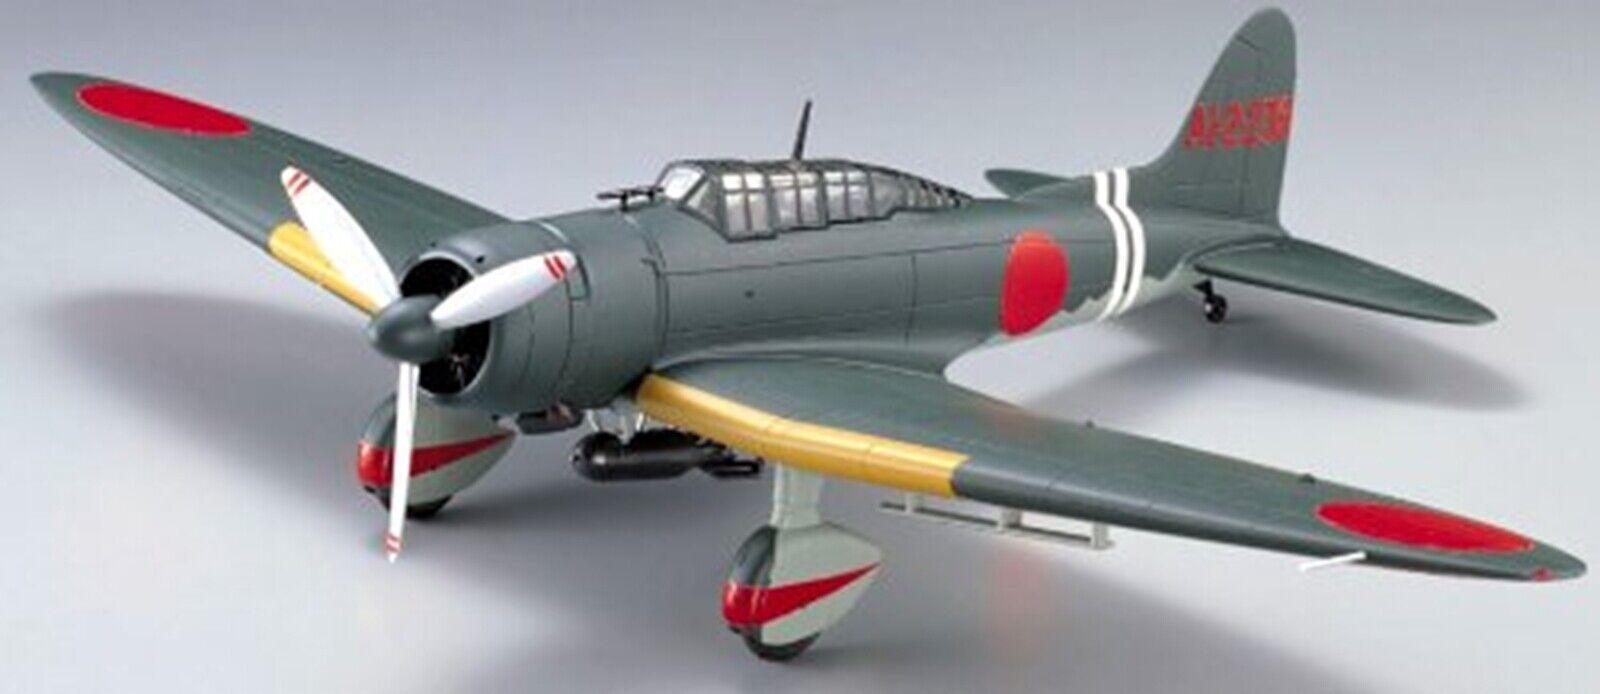 Marushin Shokaku Type99 Atavola Bomber modellolo 22 Portaerei 148 Nuovo FS